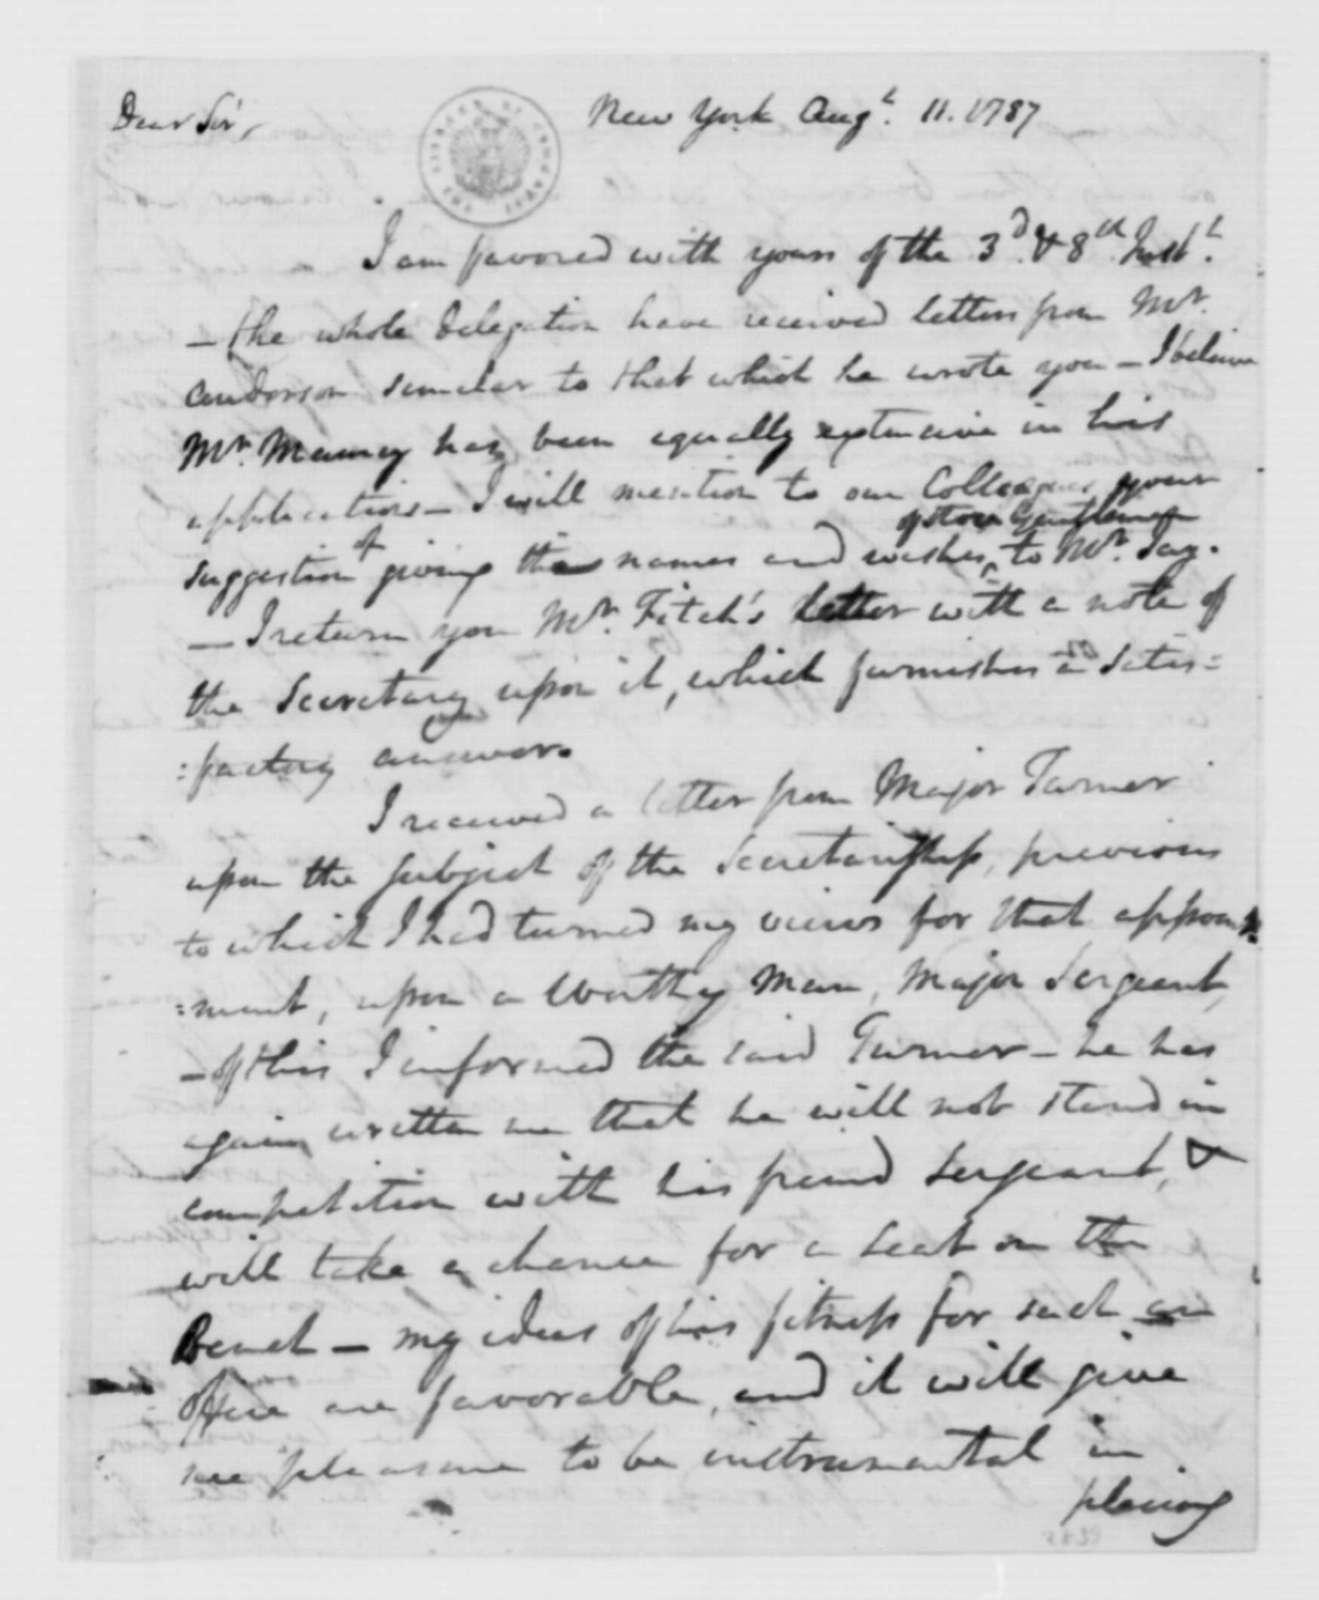 Edward Carrington to James Madison, August 11, 1787. [Original Incomplete].